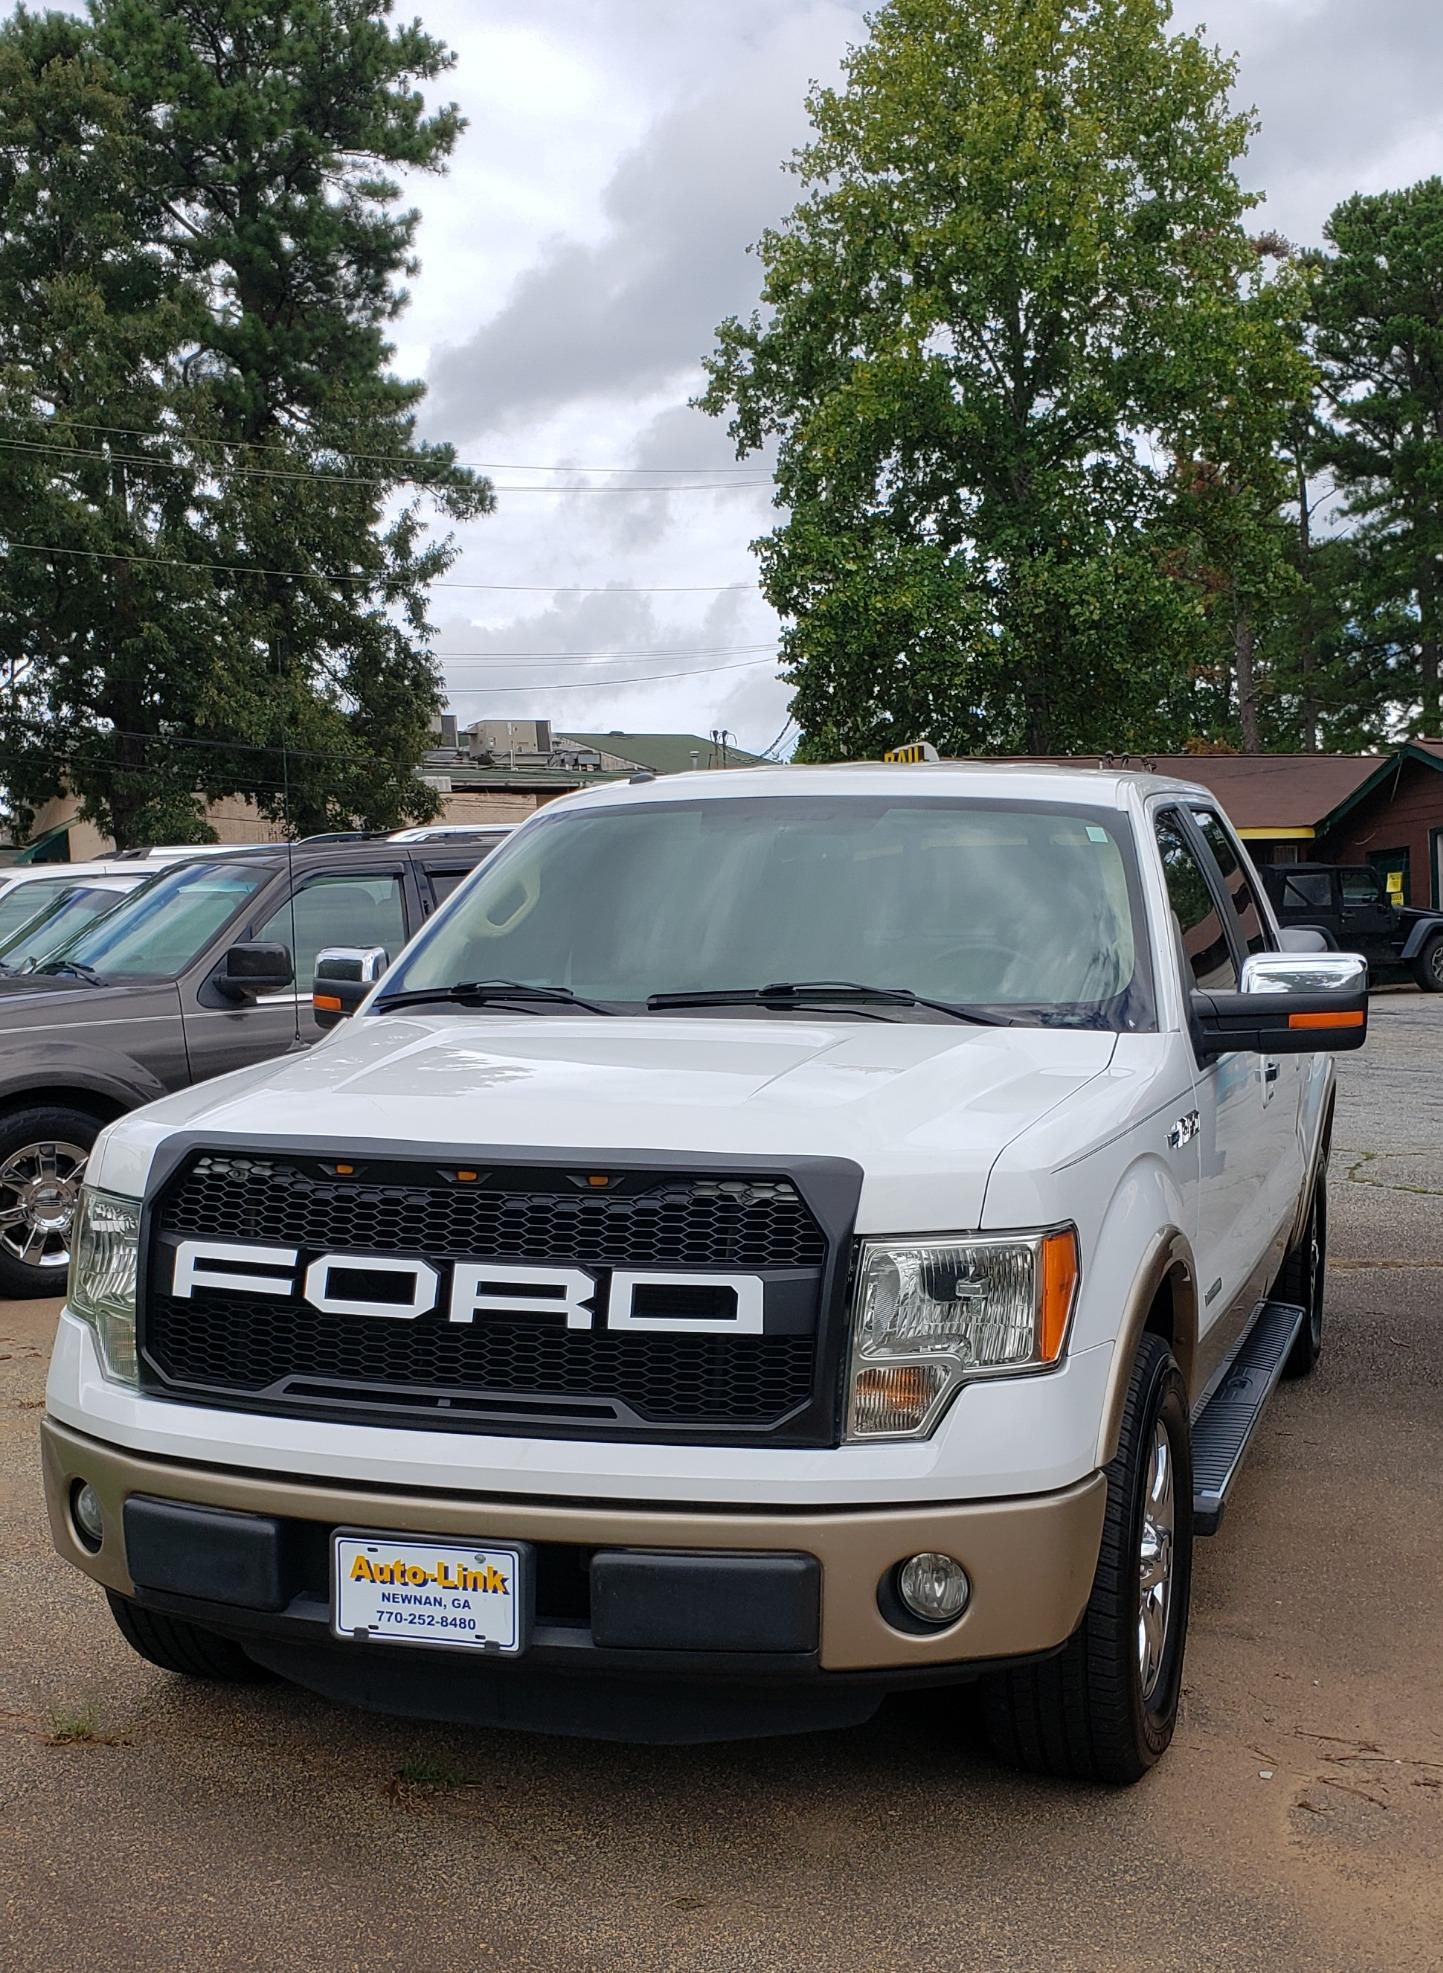 2012 Ford F150 Quad cab